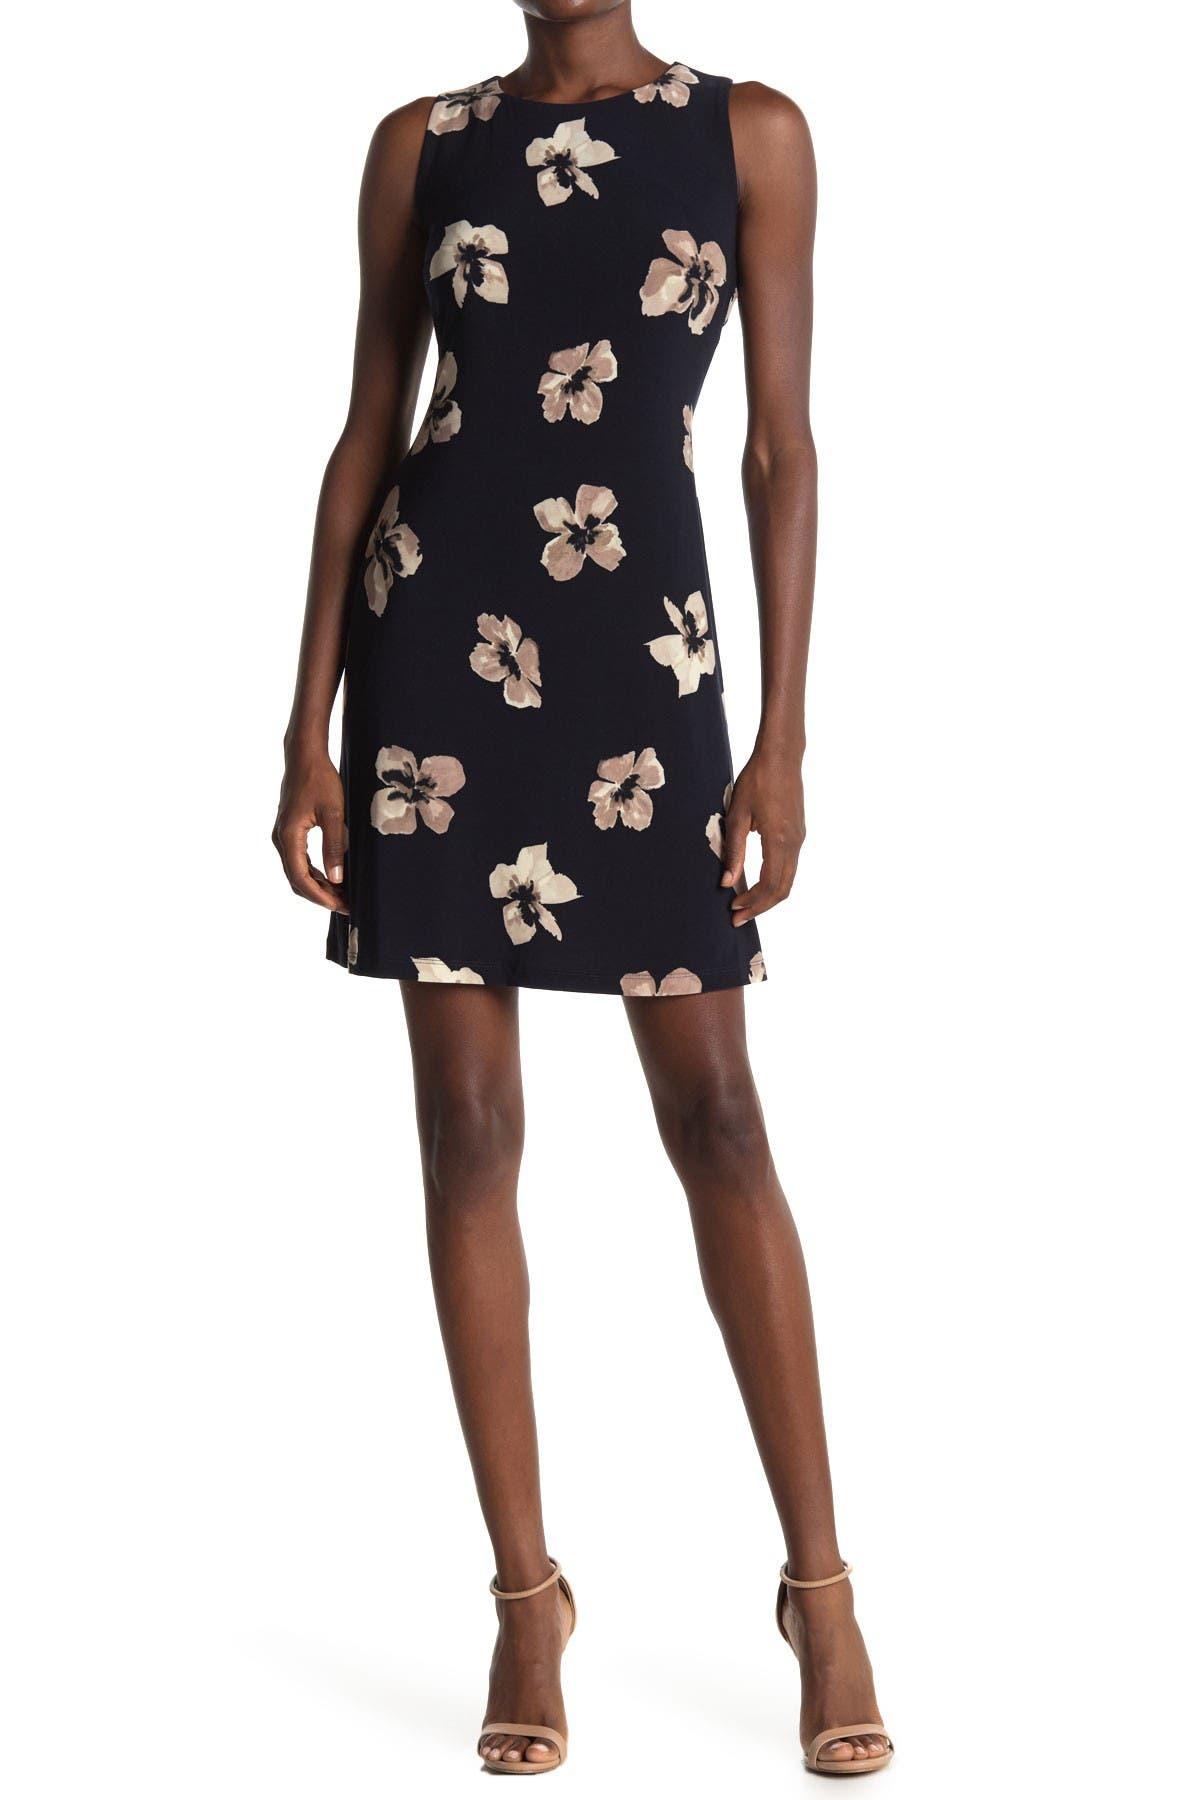 Image of Tommy Hilfiger Floral Sleeveless Jersey Shift Dress